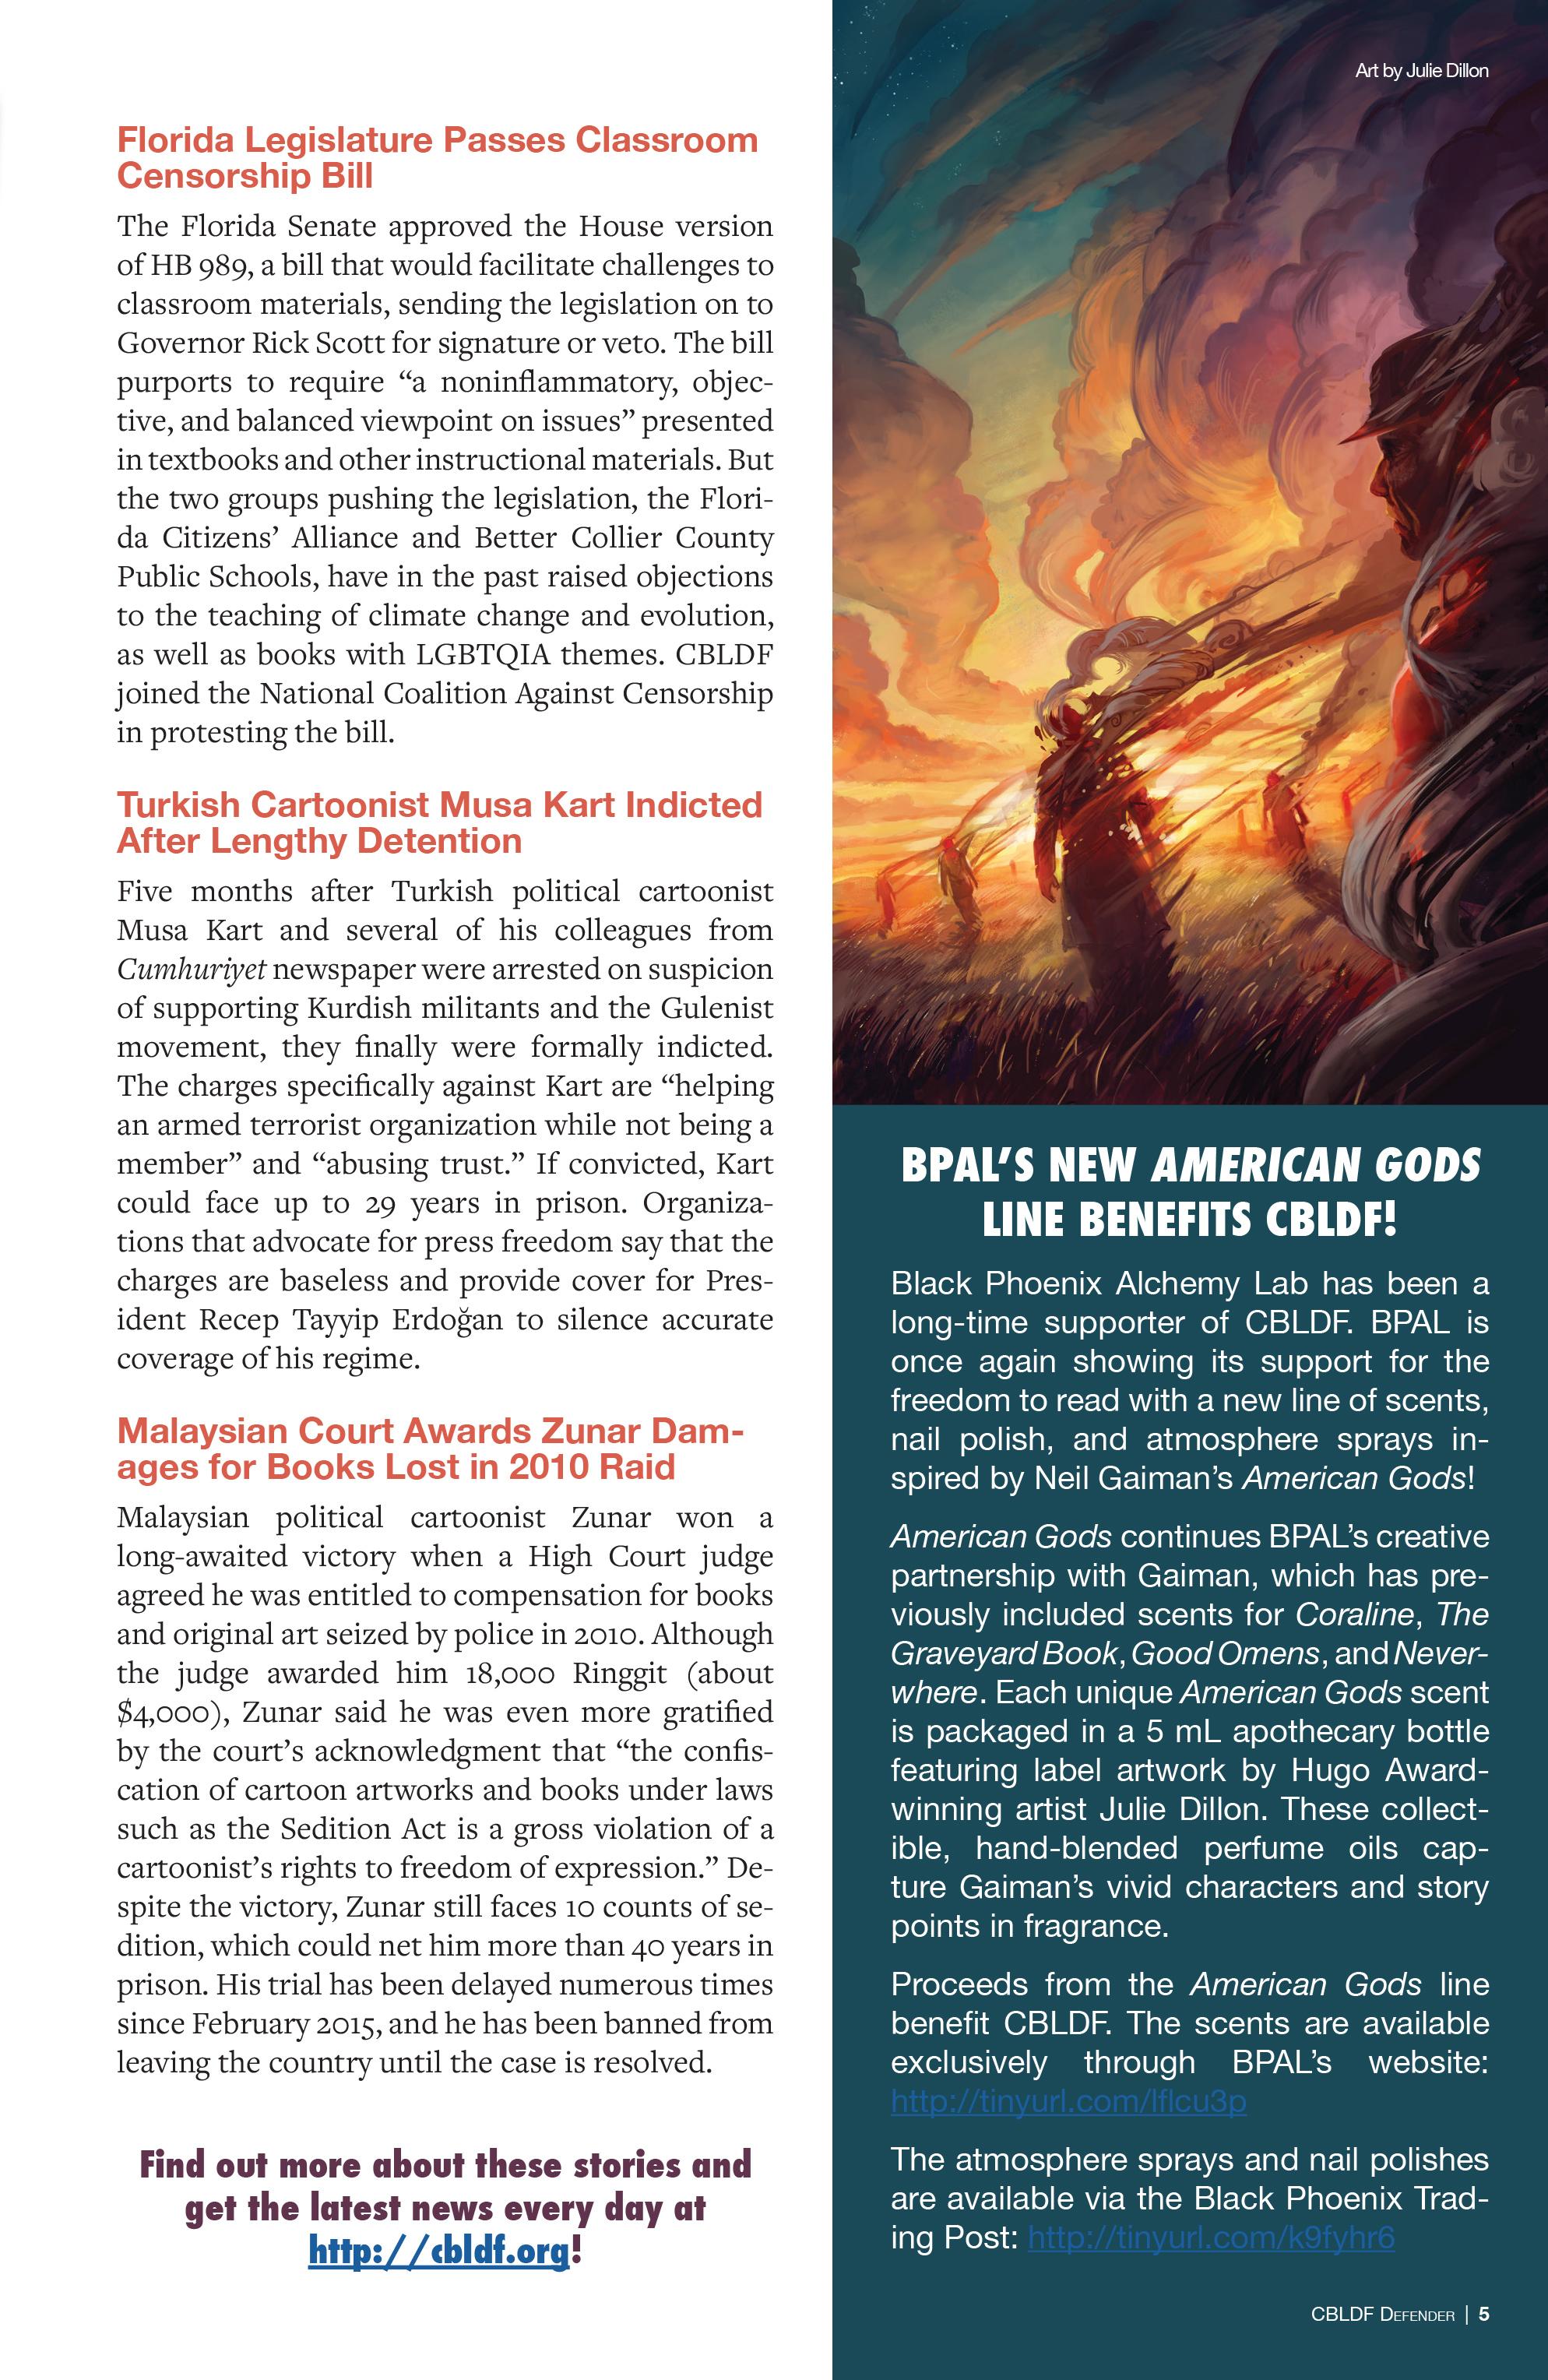 Read online CBLDF Defender Vol. 2 comic -  Issue #2 - 5